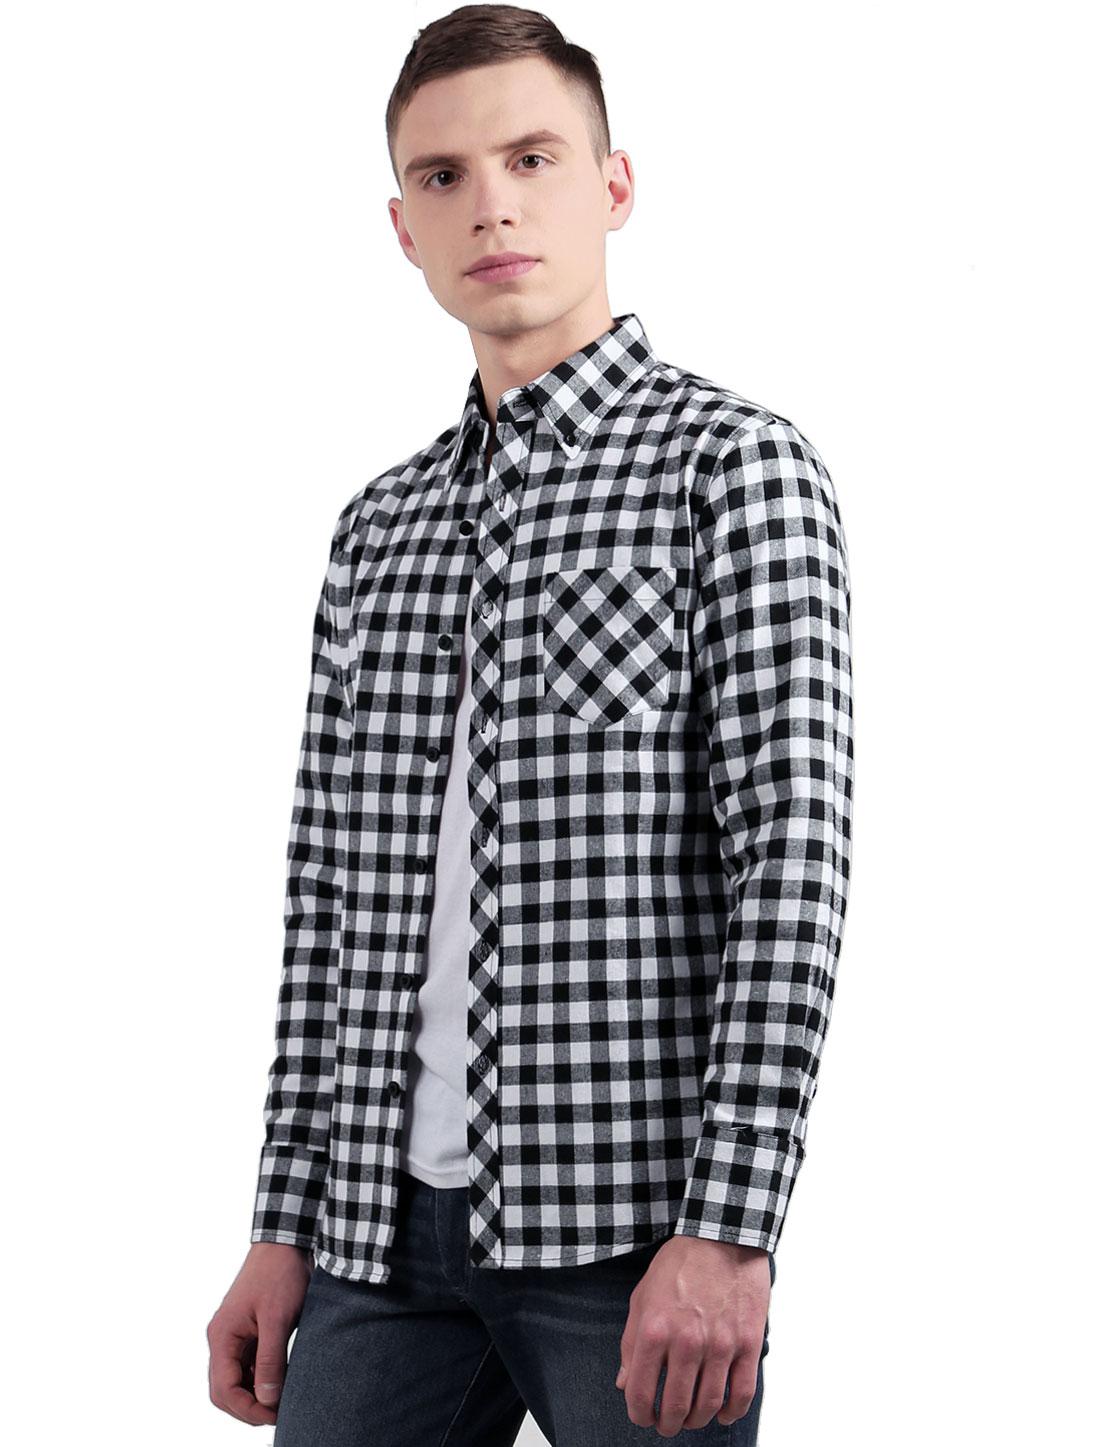 Men Pocket Point Collar Plaids Fannel Long Sleeves Button Down Shirt Black White L